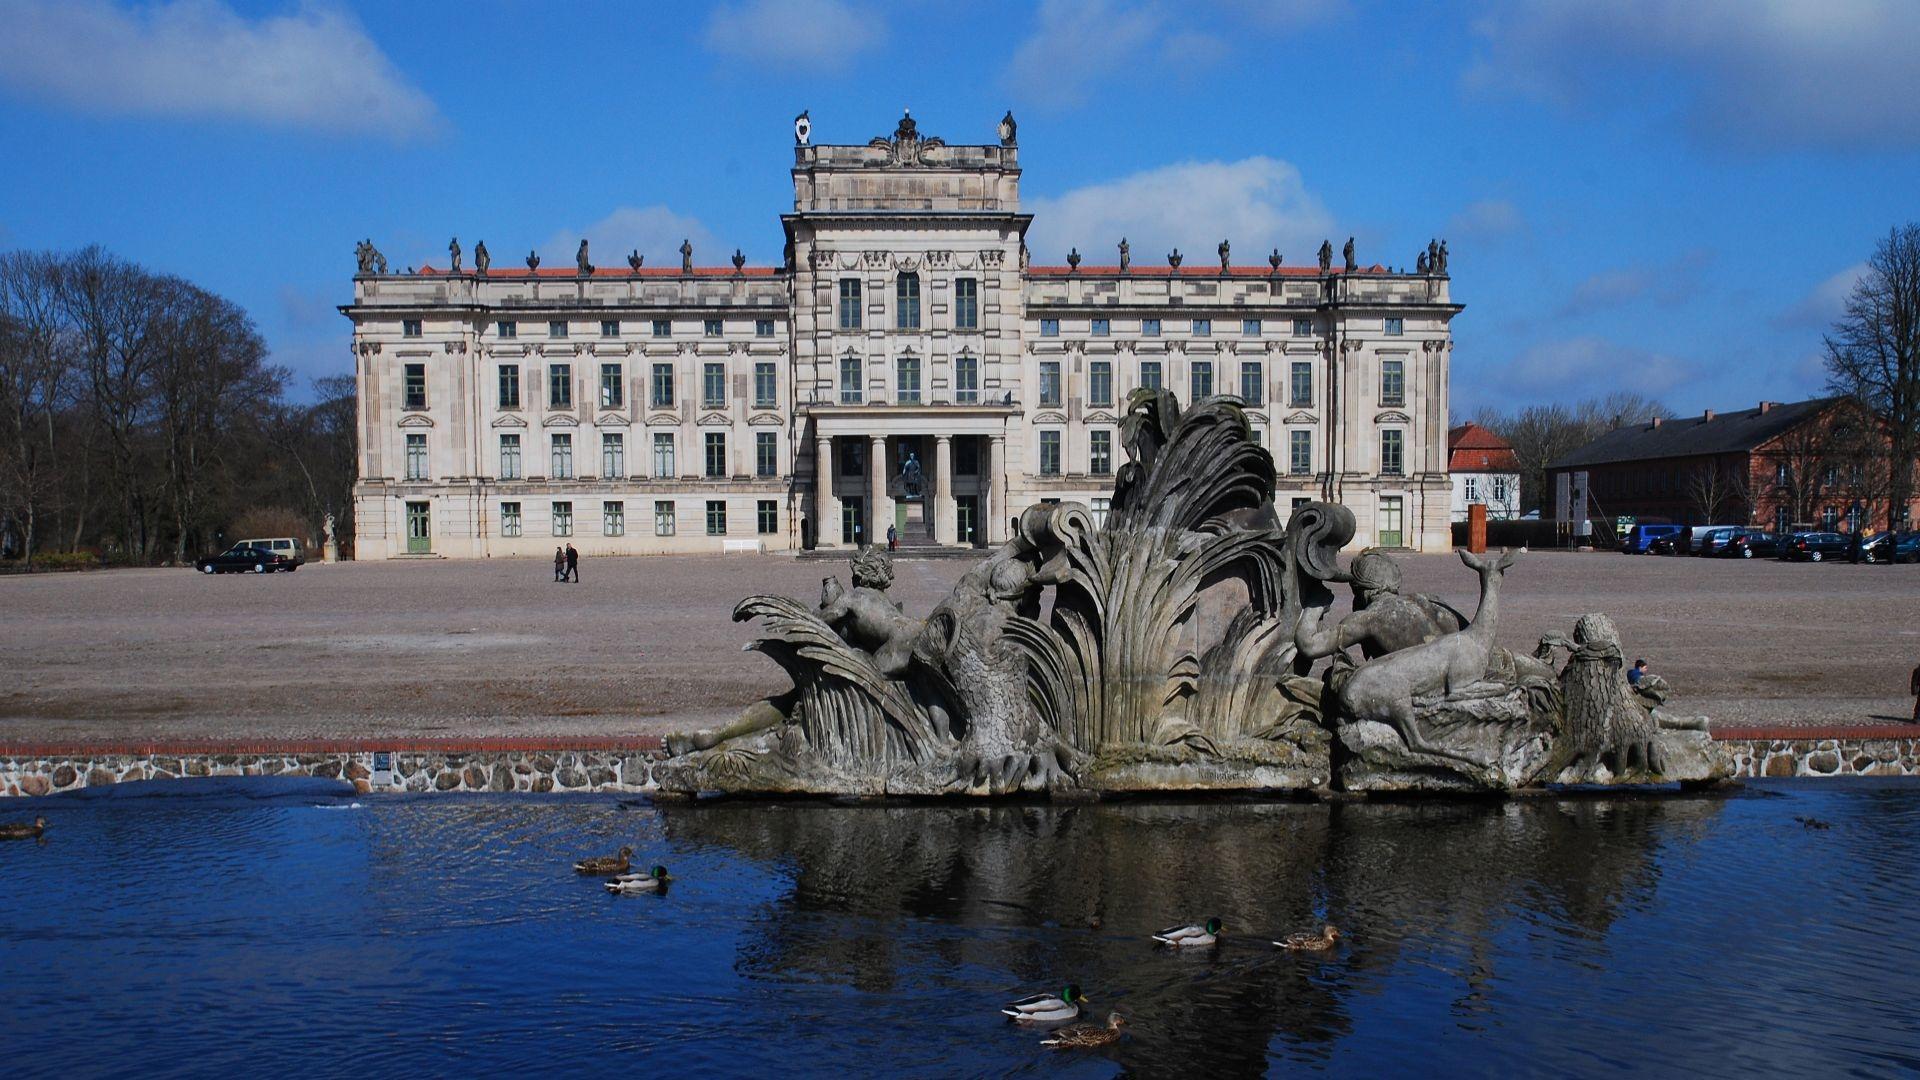 Ludwigslust Palace wallpapers HD quality